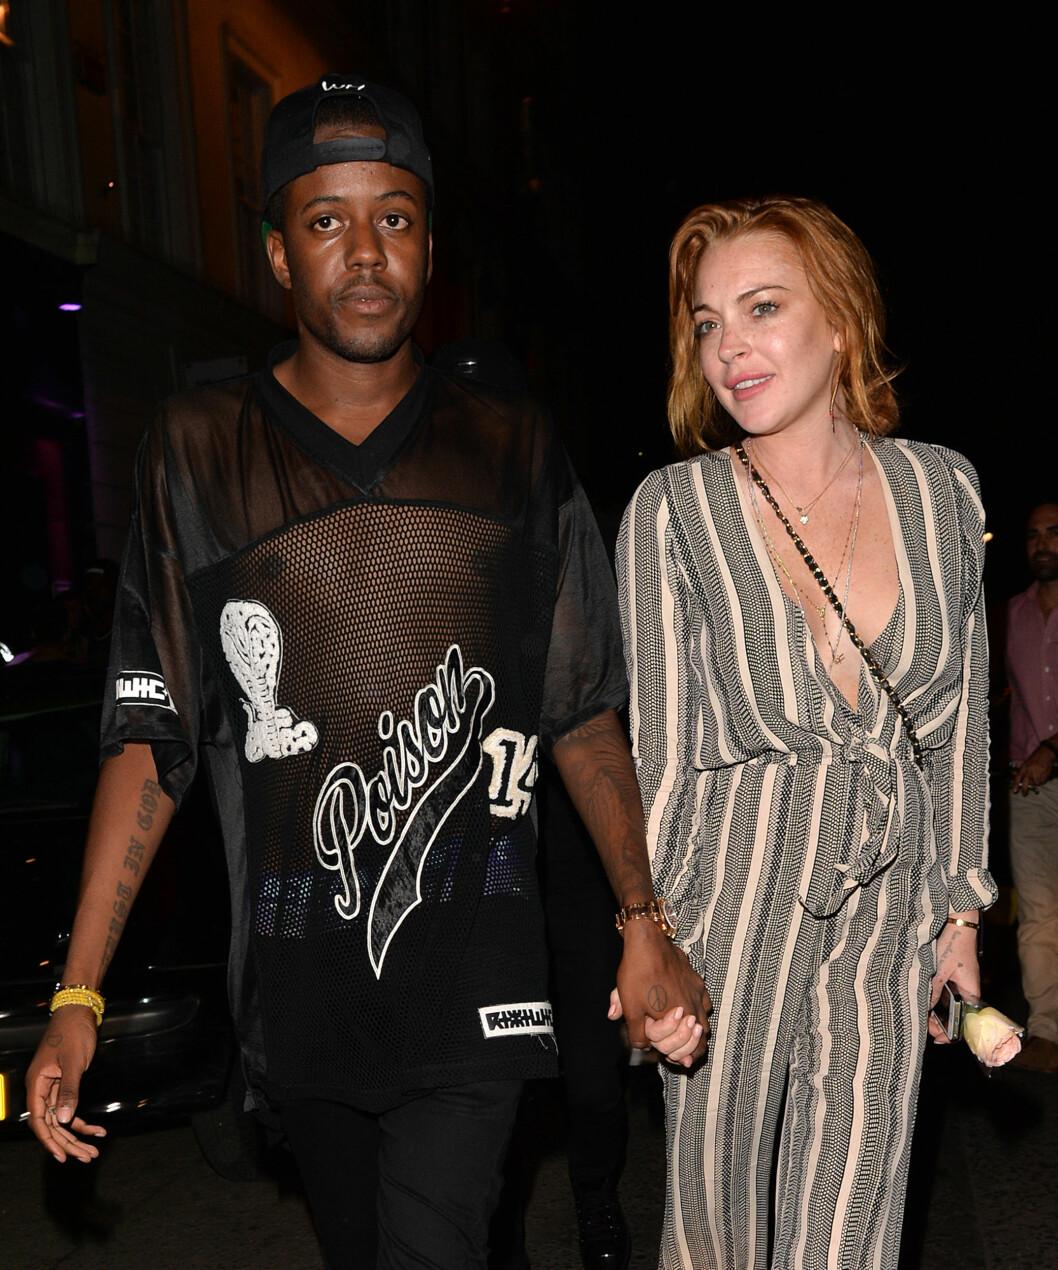 GODE VENNER: Lindsay har funnet tonen med designeren Vas J Morgan på Ibiza. Han er også kjent fra TV-serien «The Only Way is Essex». Foto: Gotcha Images / Splash News/ All Over Press